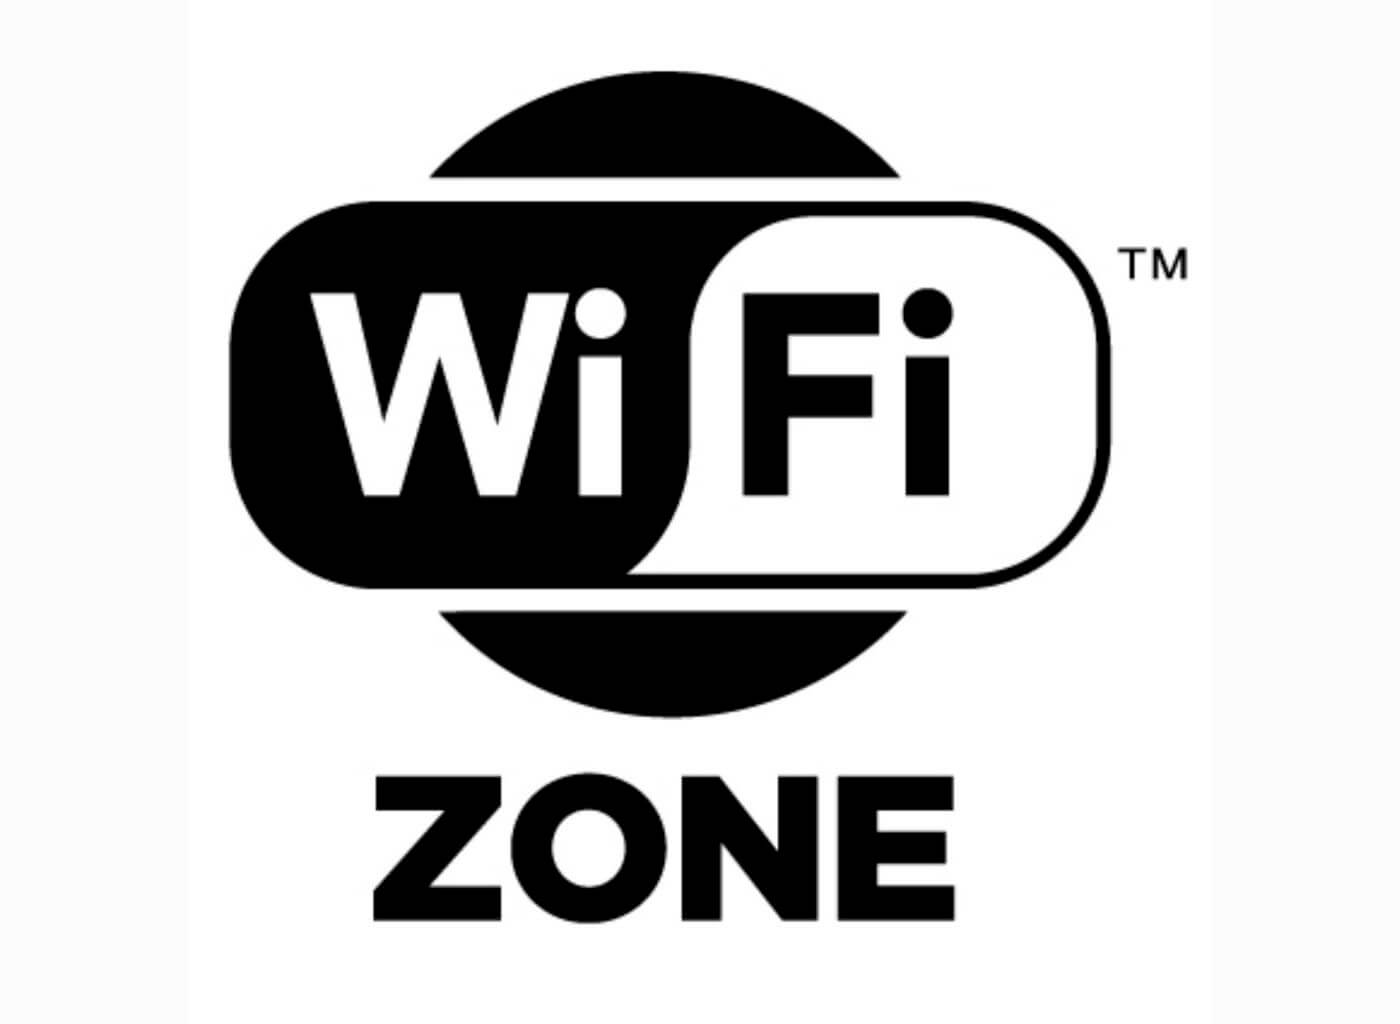 Знак беспроводного интернета